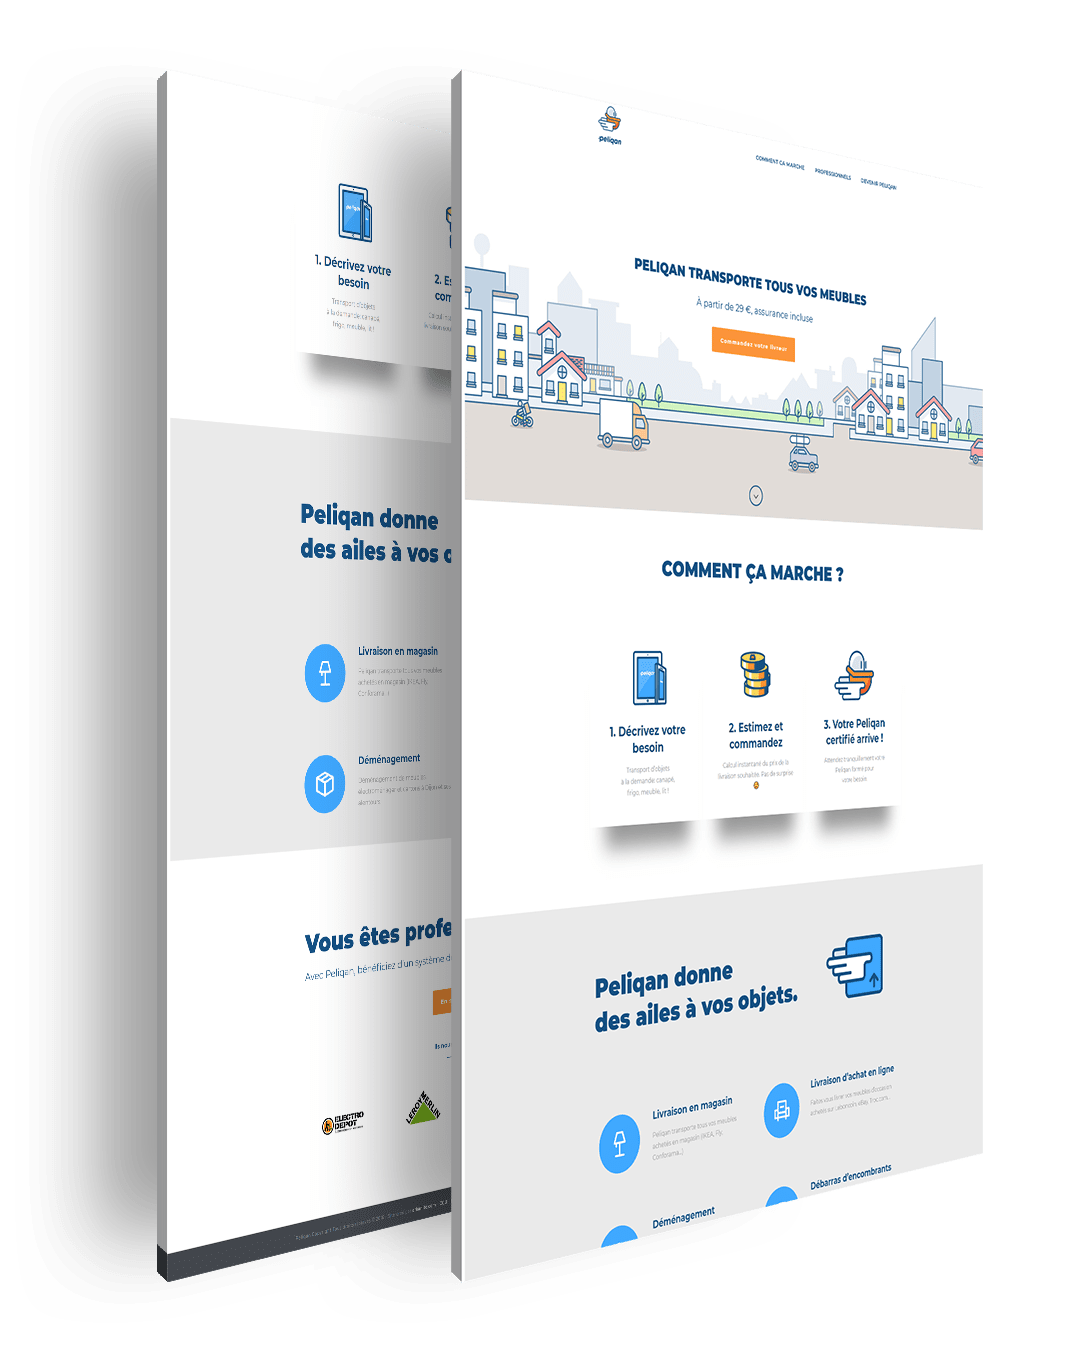 page entiere Peliqan application mobile agence lyon wordpress illustration logo graphisme web design developpement